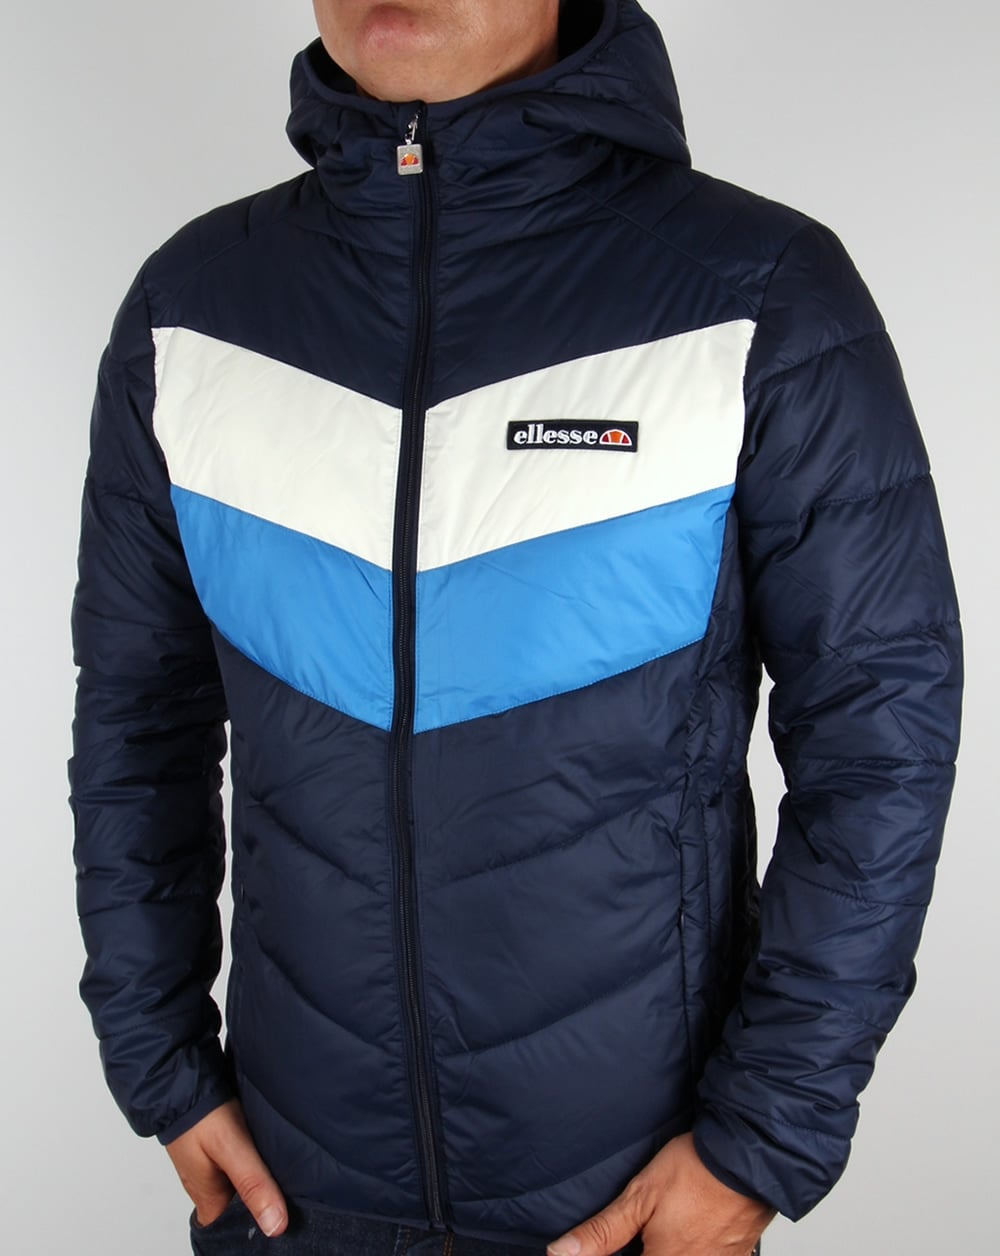 Ellesse Ski Jacket Navy Blue